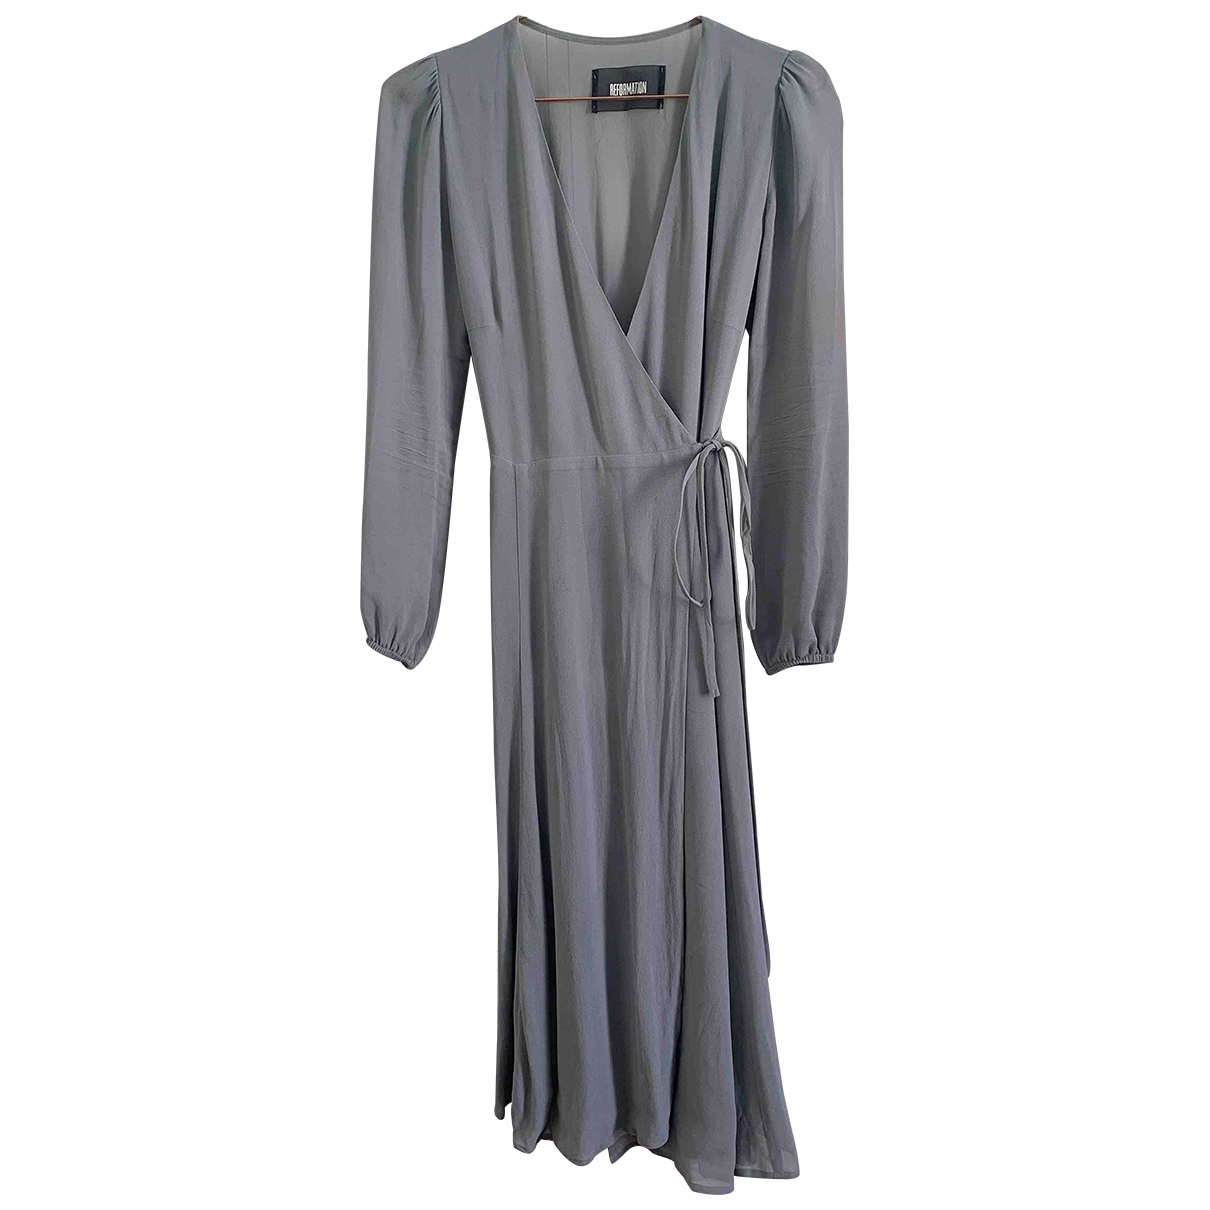 Reformation \N Blue dress for Women XS International